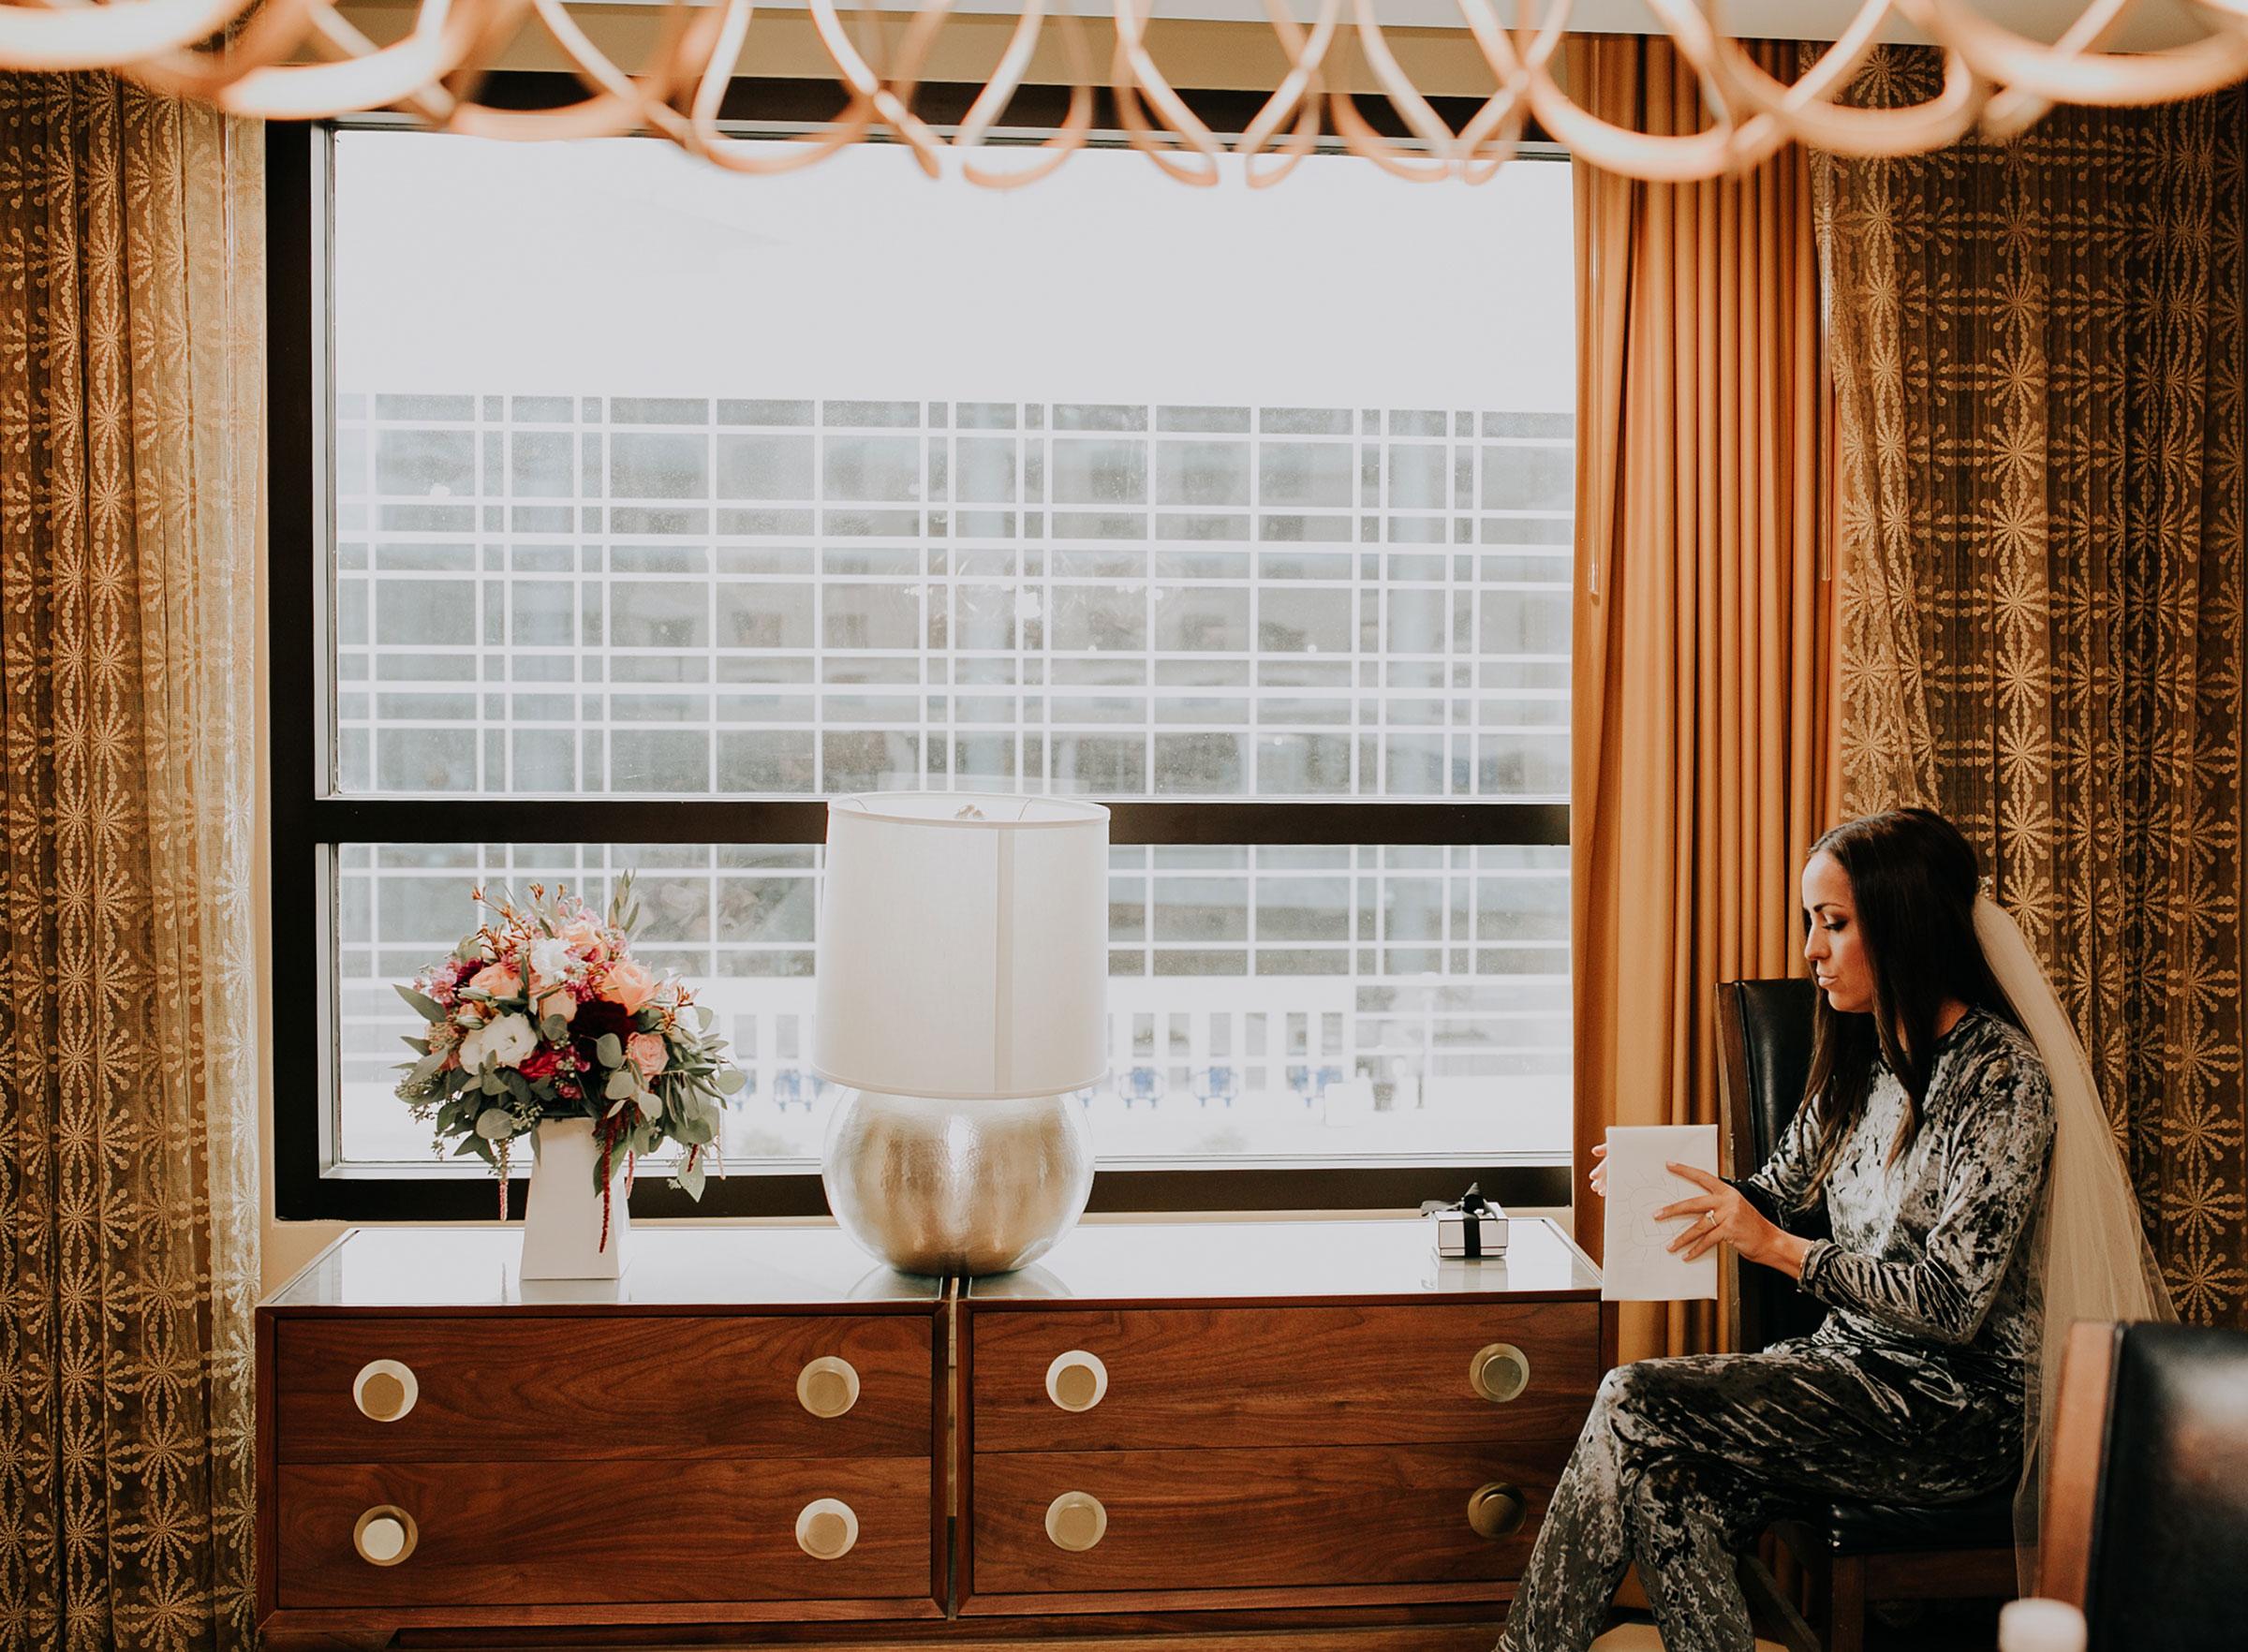 bride-opening-gift-from-groom-hilton-omaha-nebraska-raelyn-ramey-photography.jpg